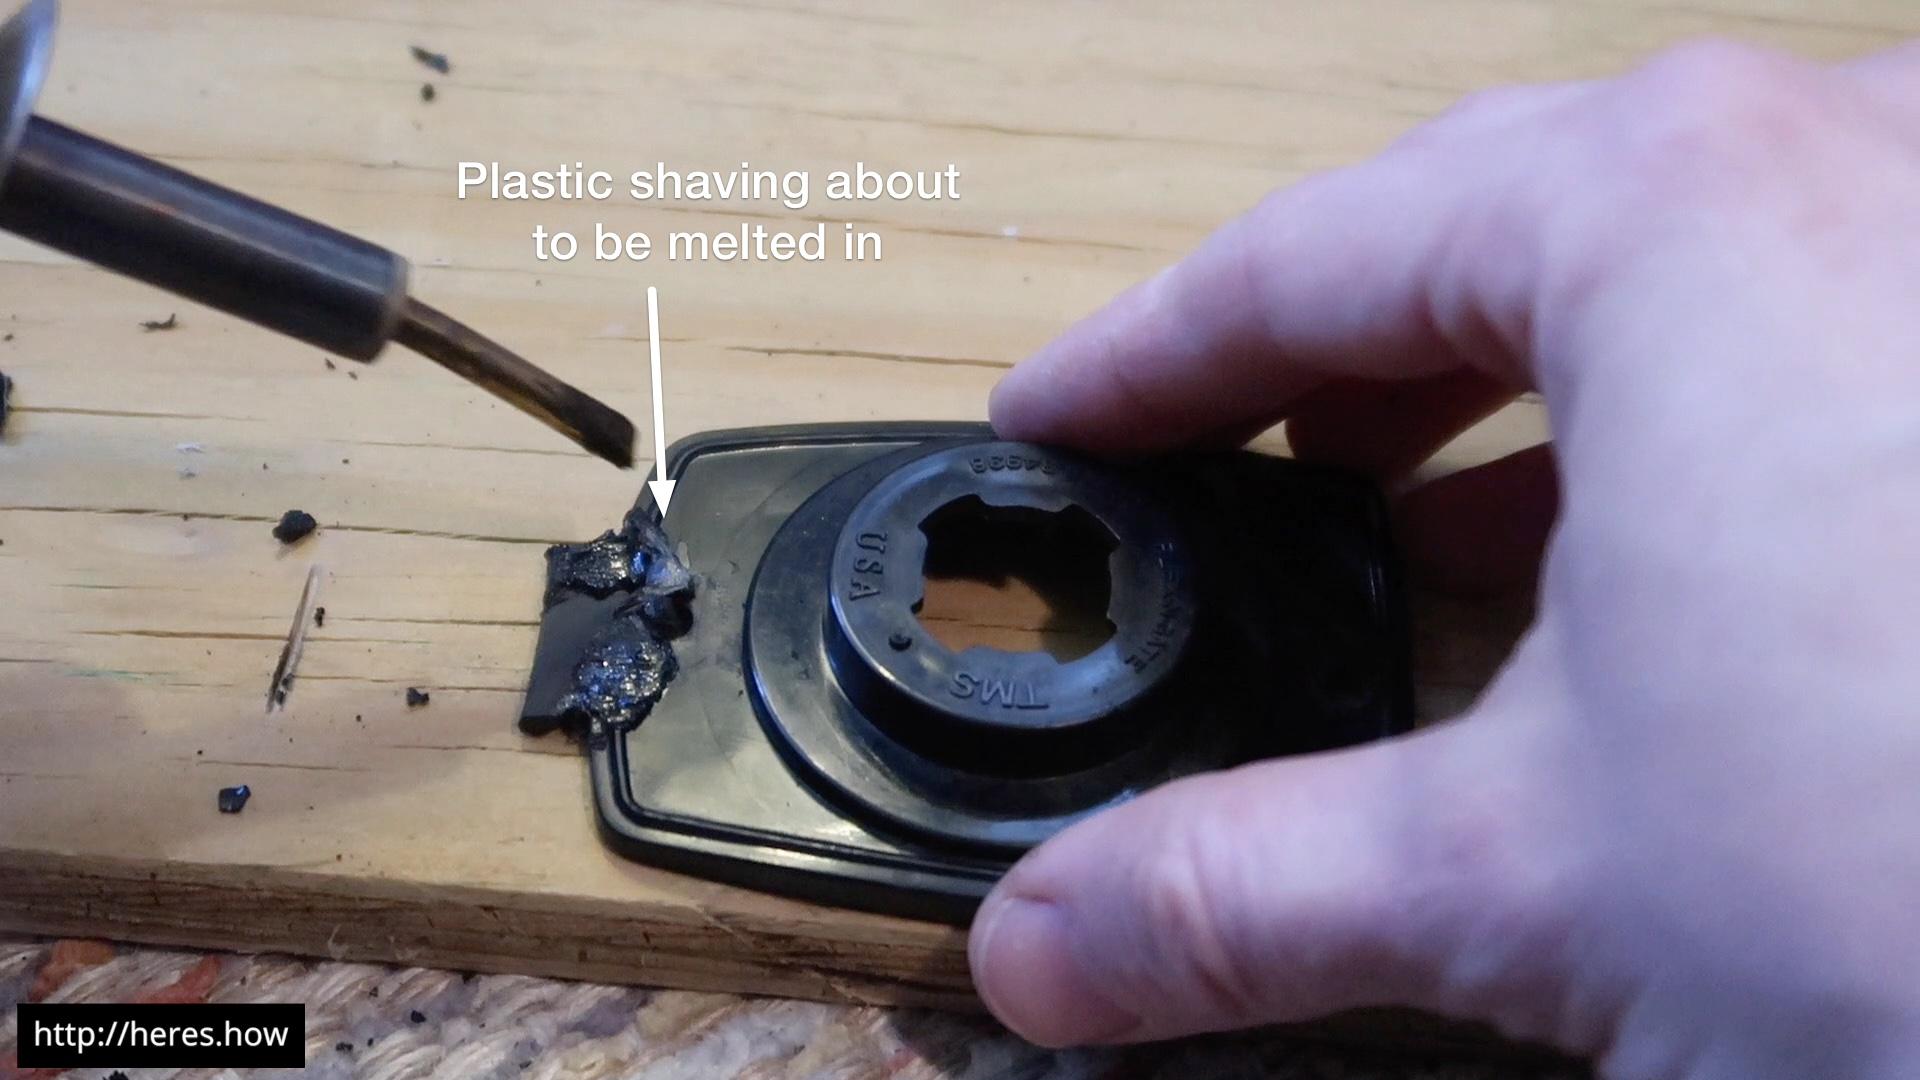 Filling gaps with plastic shavings